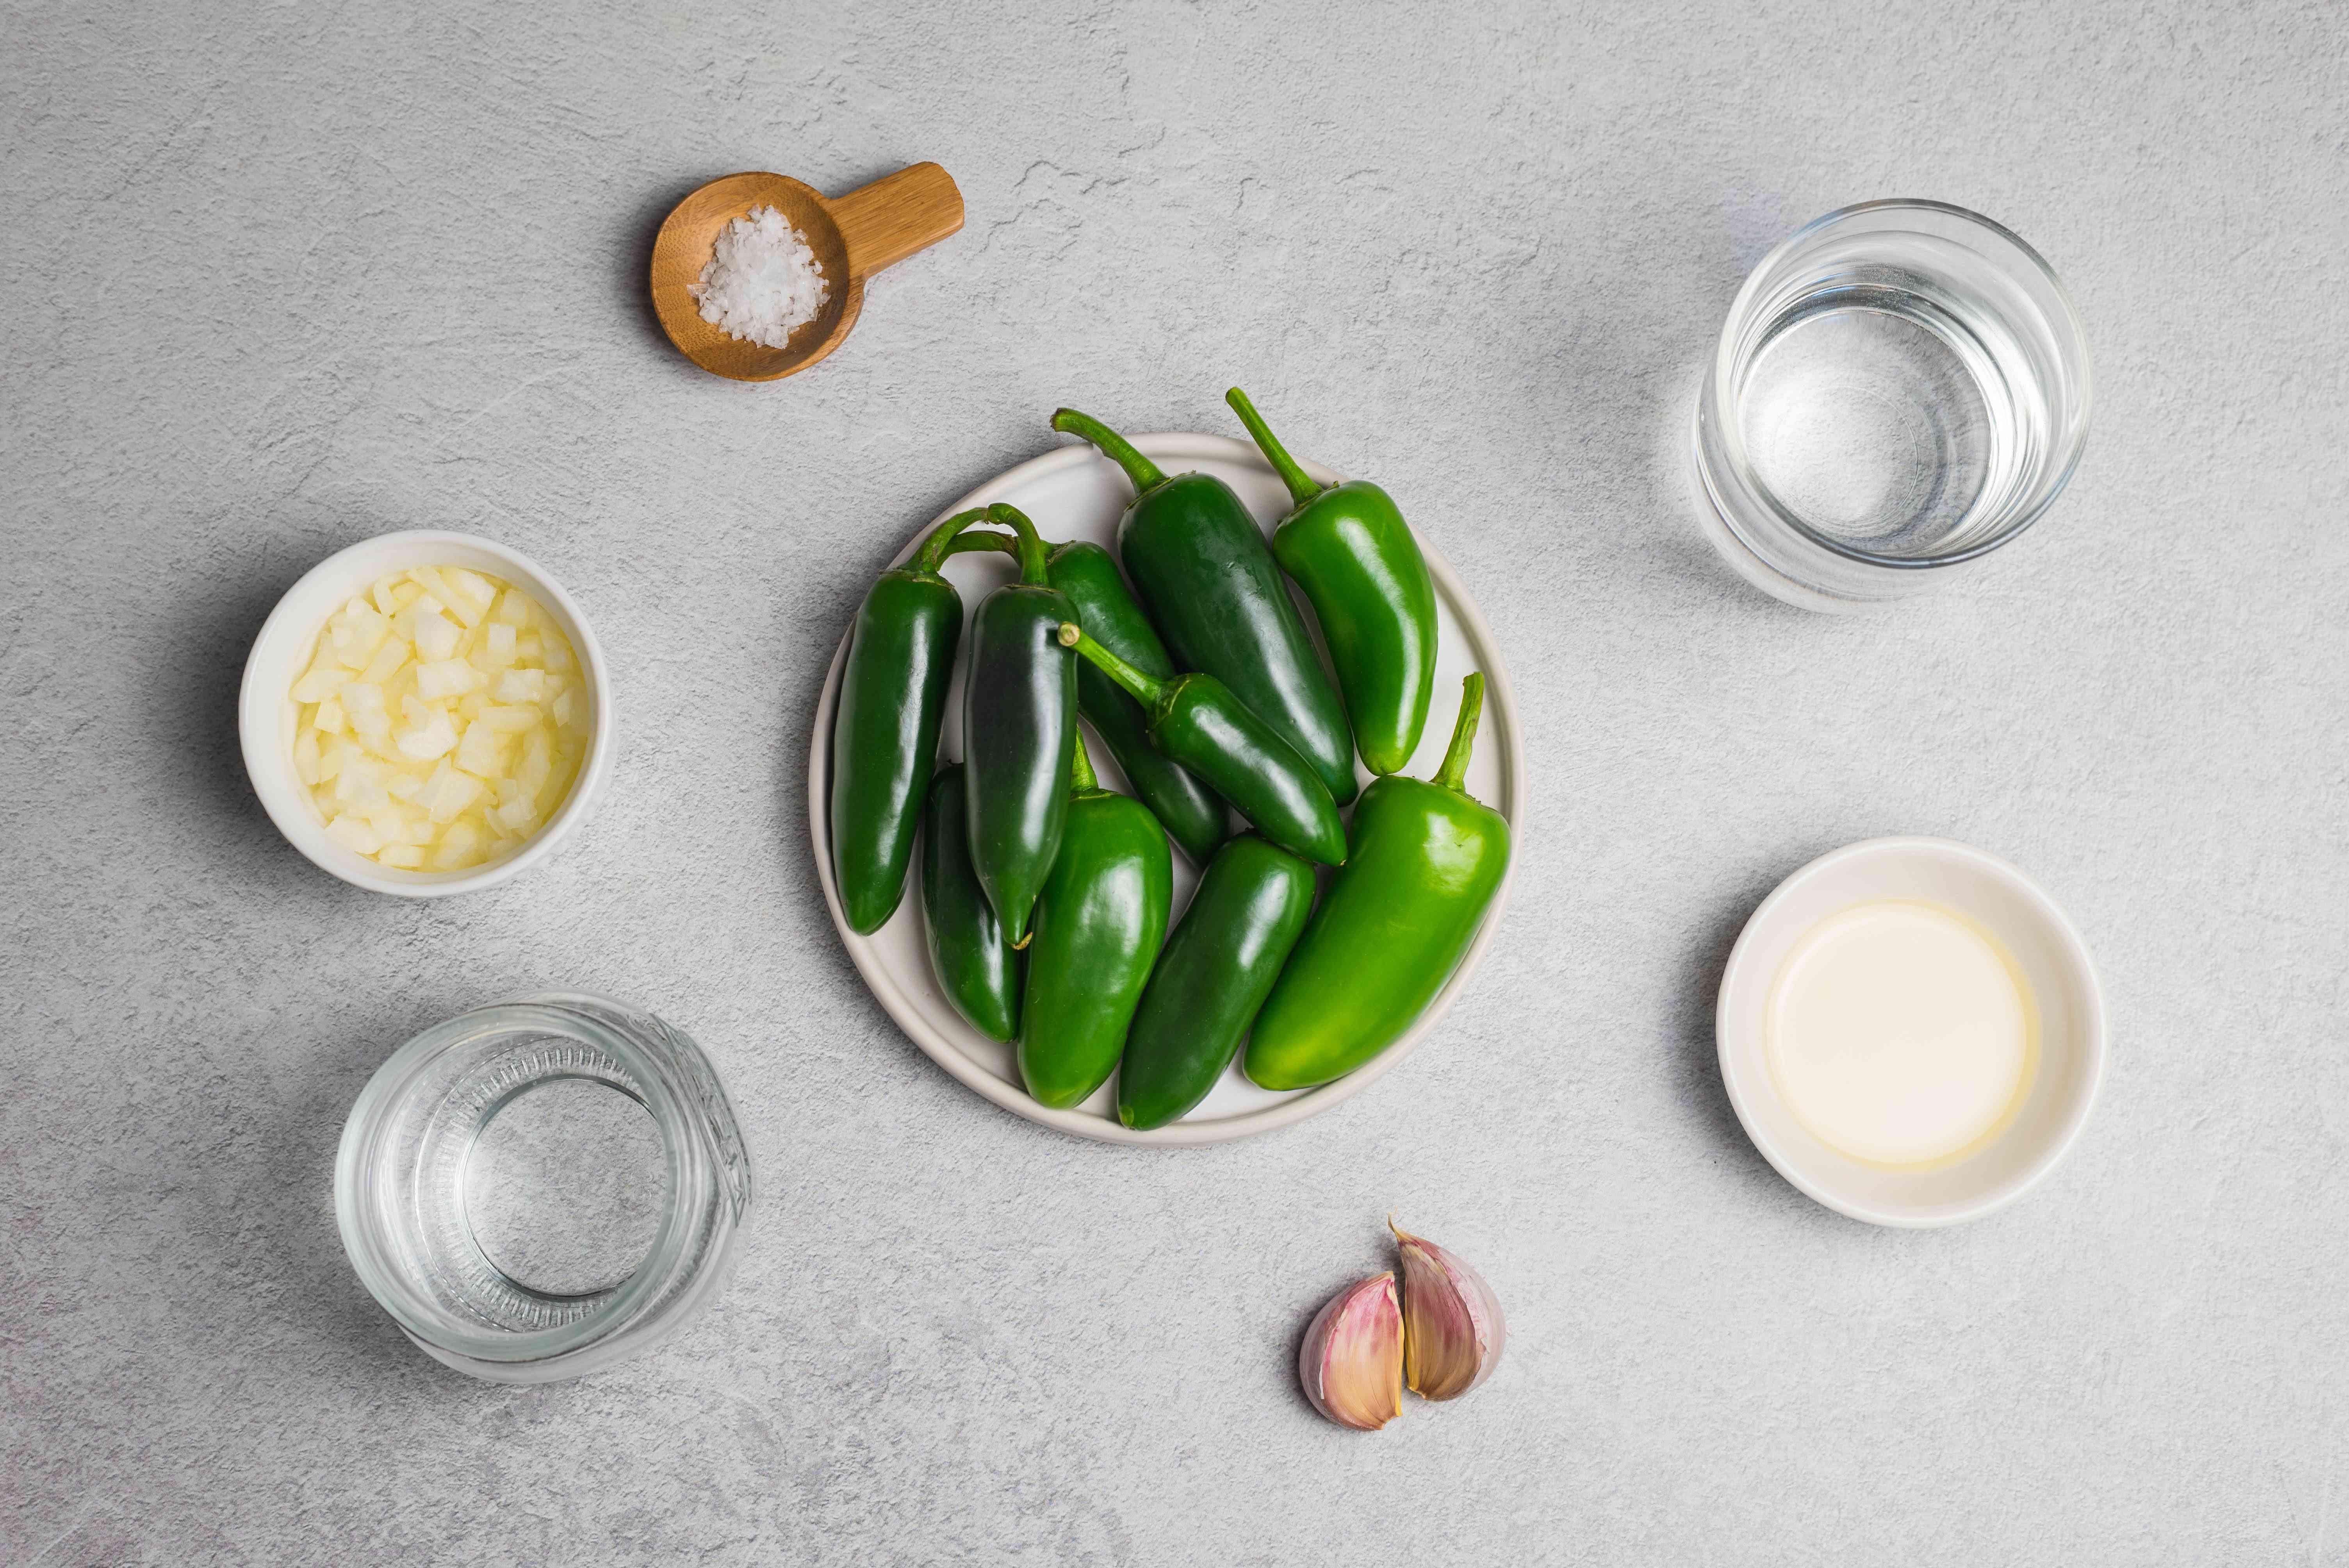 Ingredients for bottled hot sauce